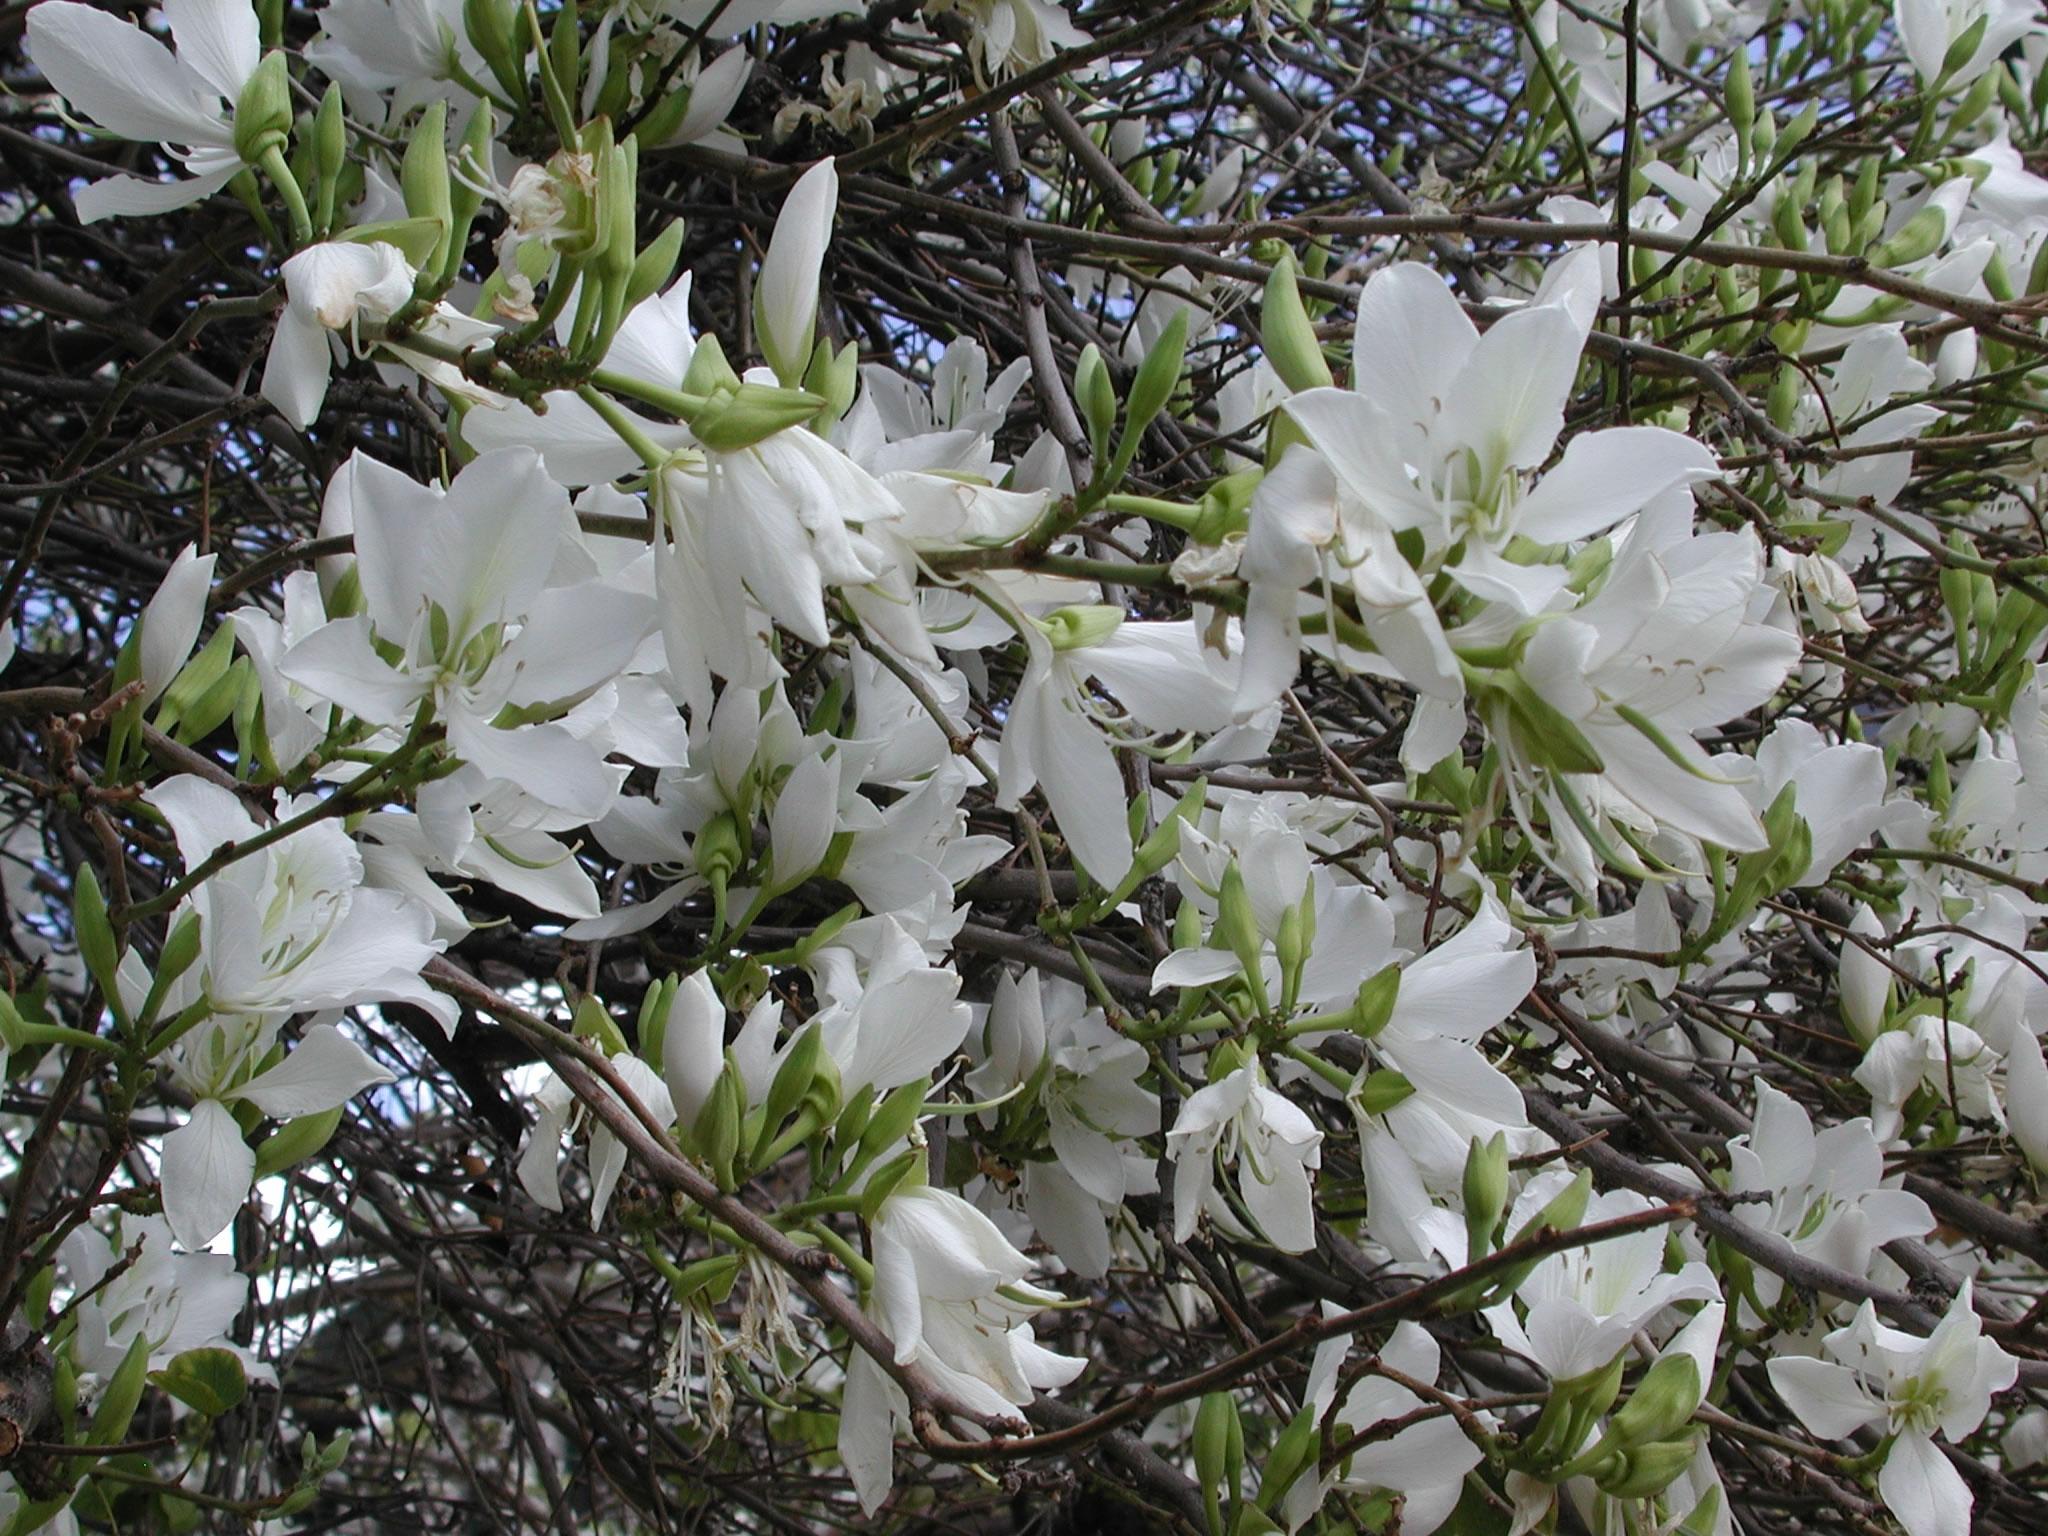 Spring blooms university of arizona campus arboretum bauhinia variegata border style solid padding 5px mightylinksfo